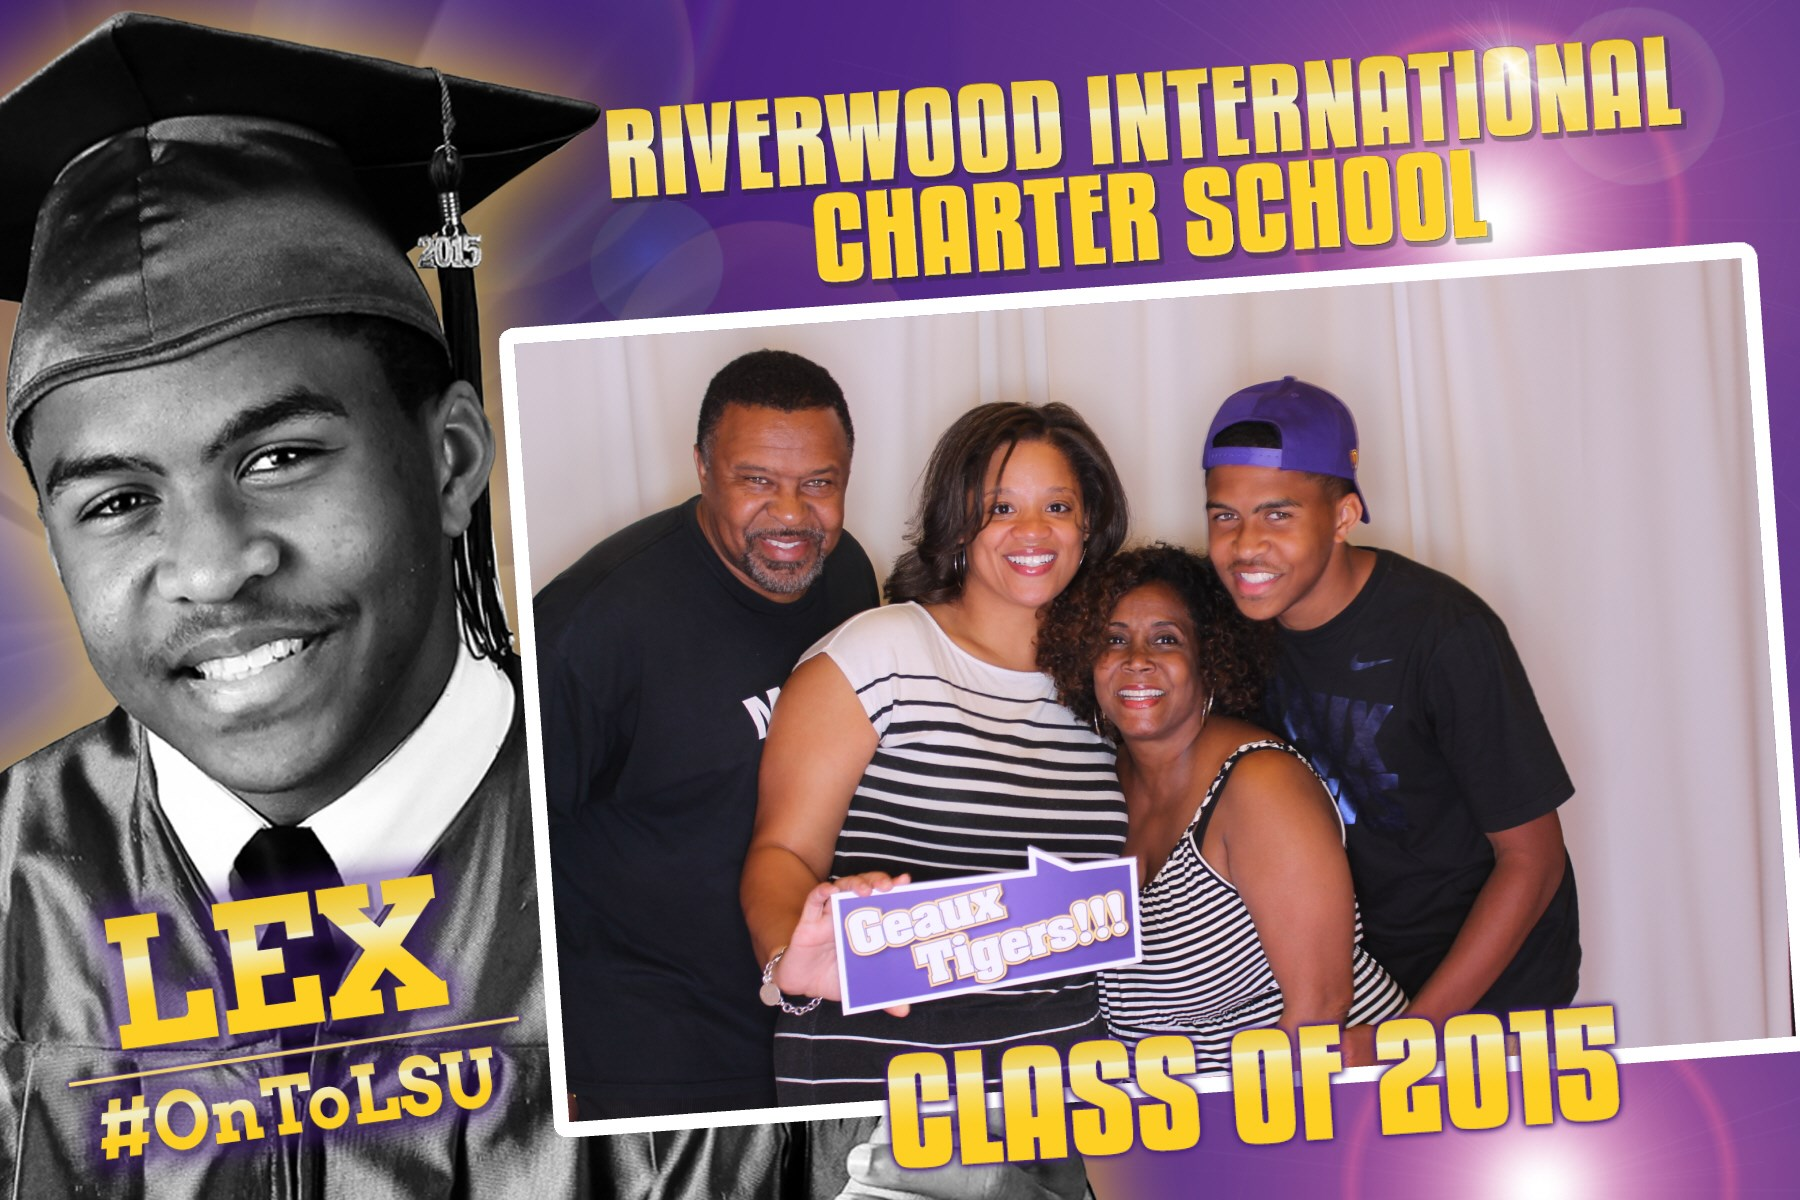 High School Graduation Photo Booth